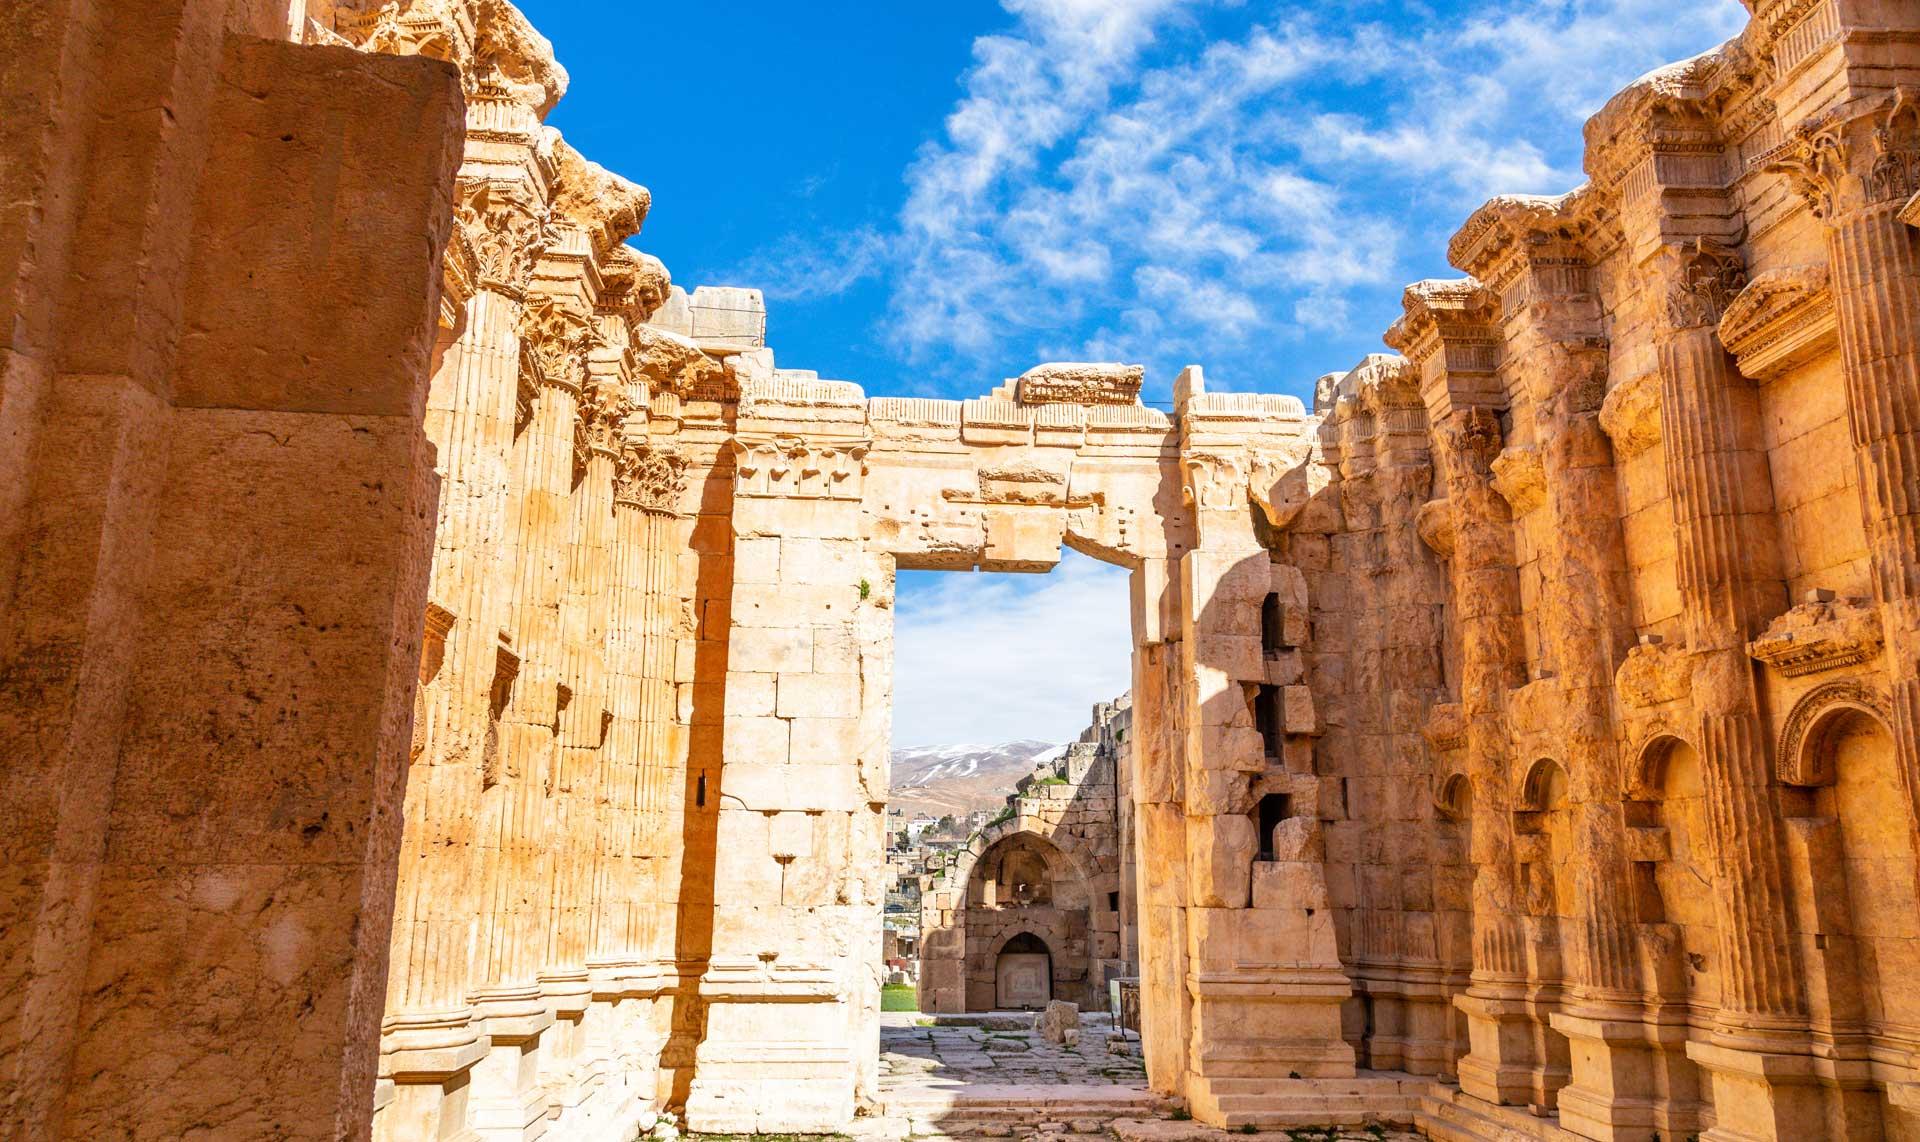 https://mundomex.com.mx/sites/default/files/revslider/image/jordania.jpg